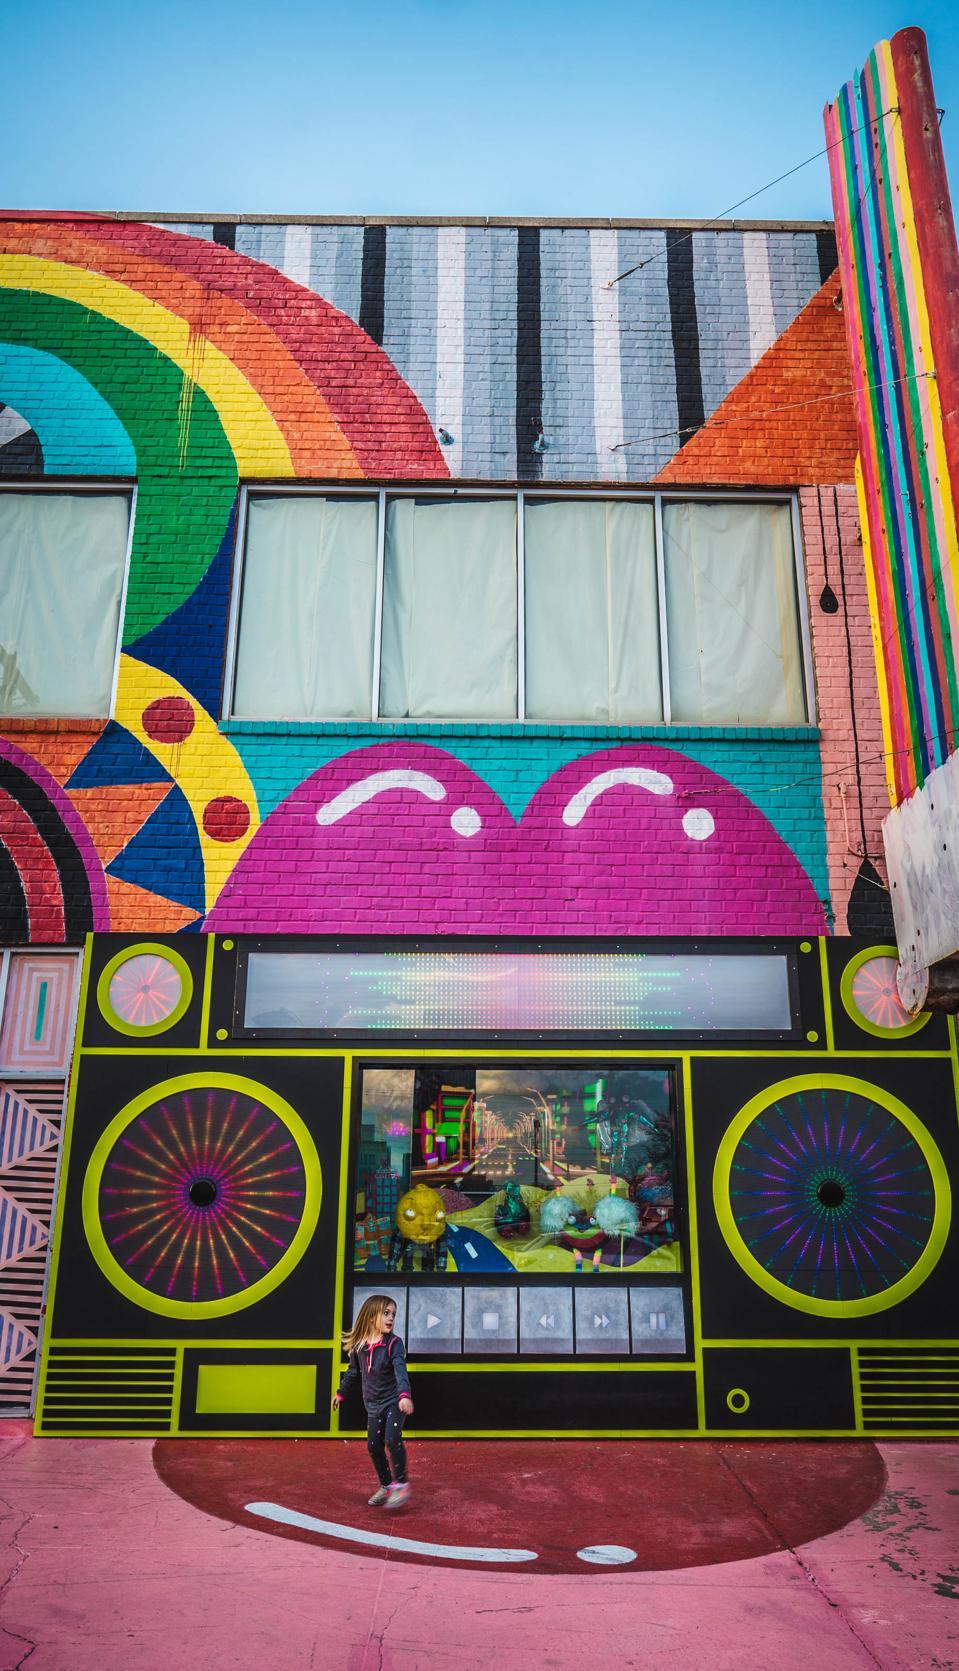 boombox street art